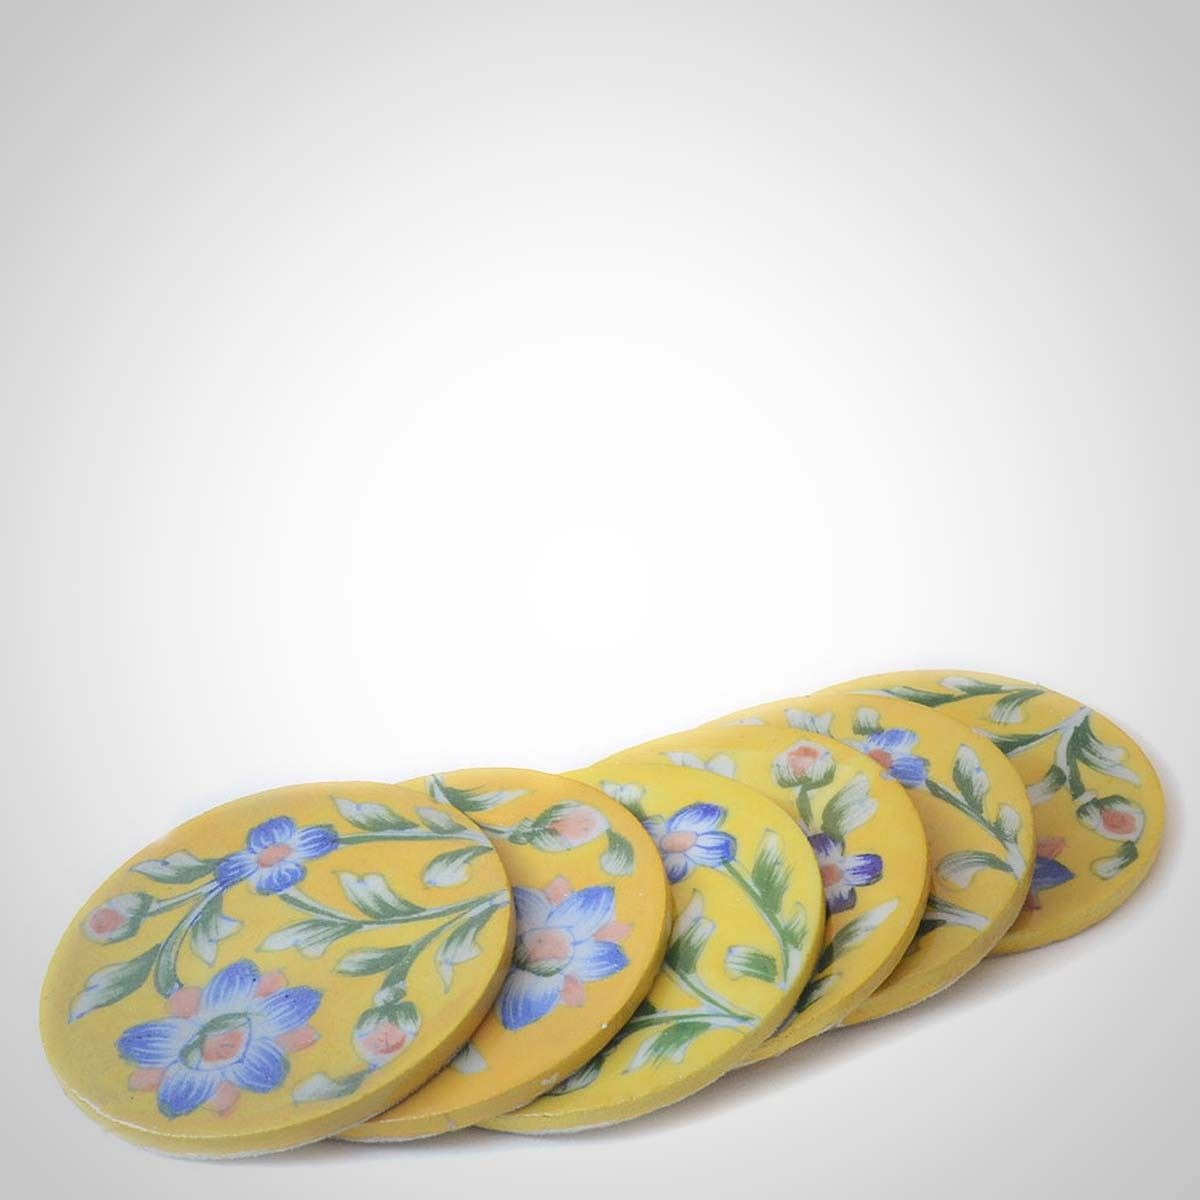 Yellow Ceramic Coasters - Set of Six - 3.5 Inches Diameter